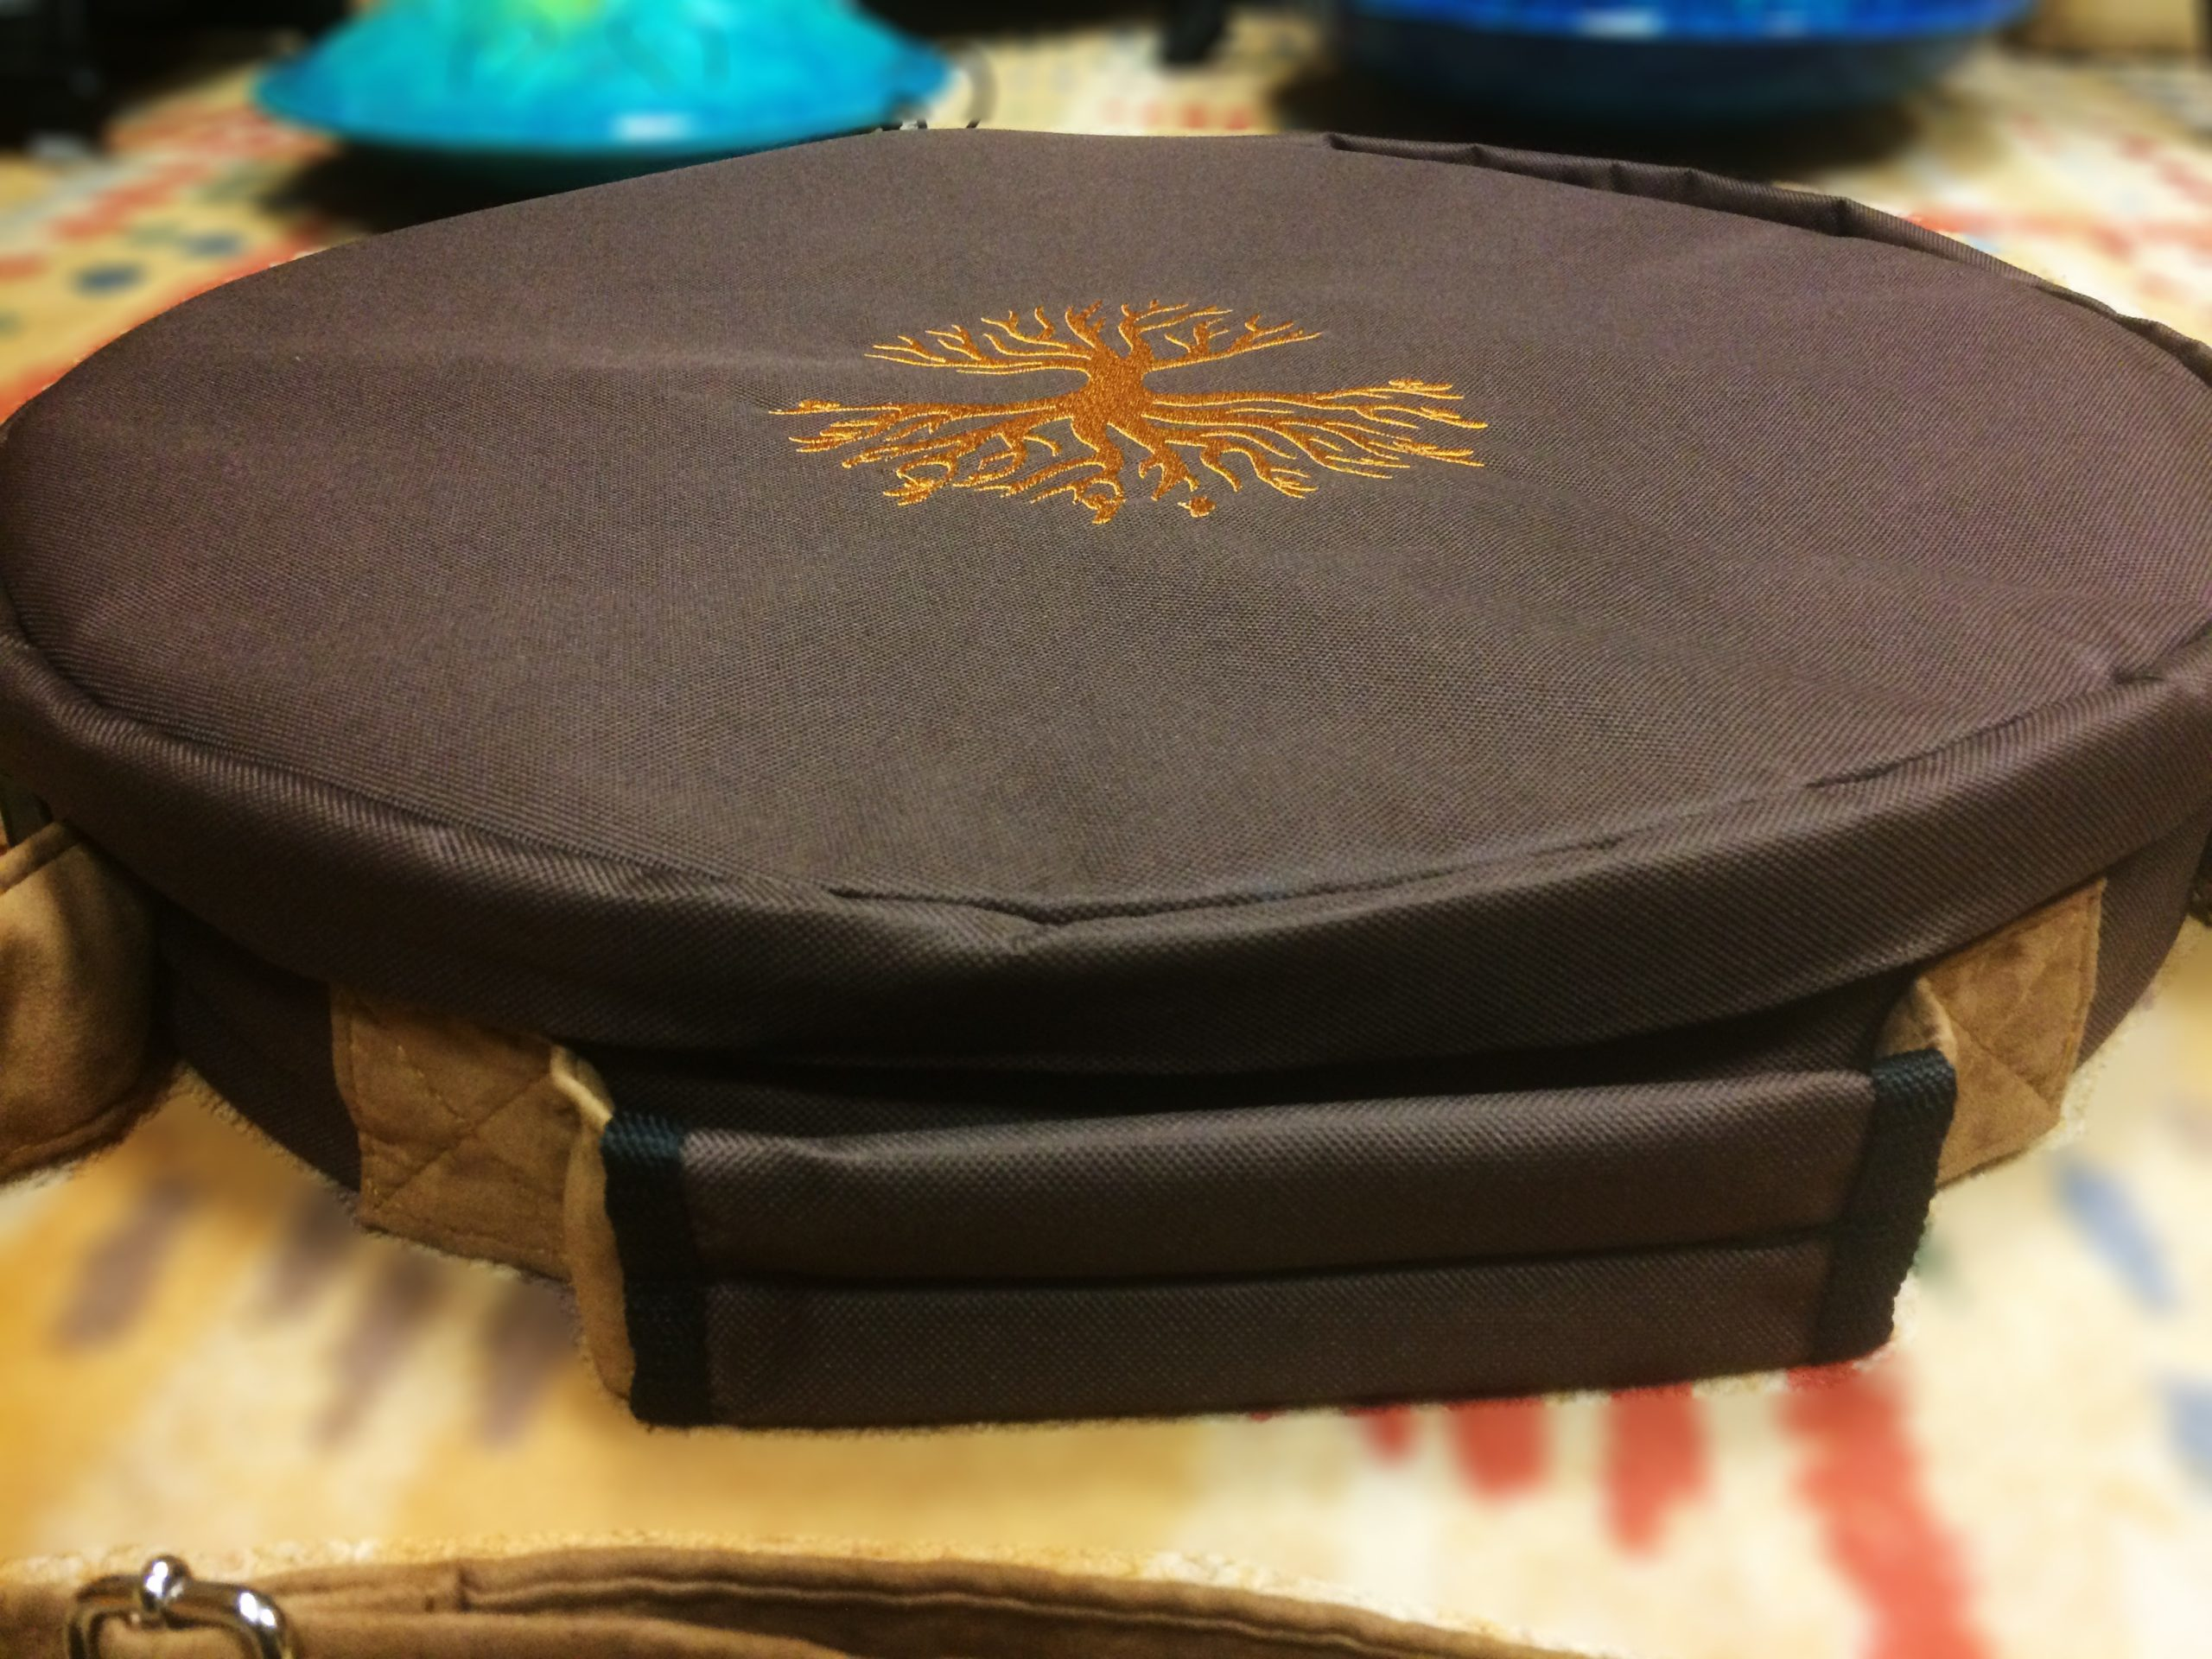 Housse deluxe tambour chamanique 40, 45 et 50cm